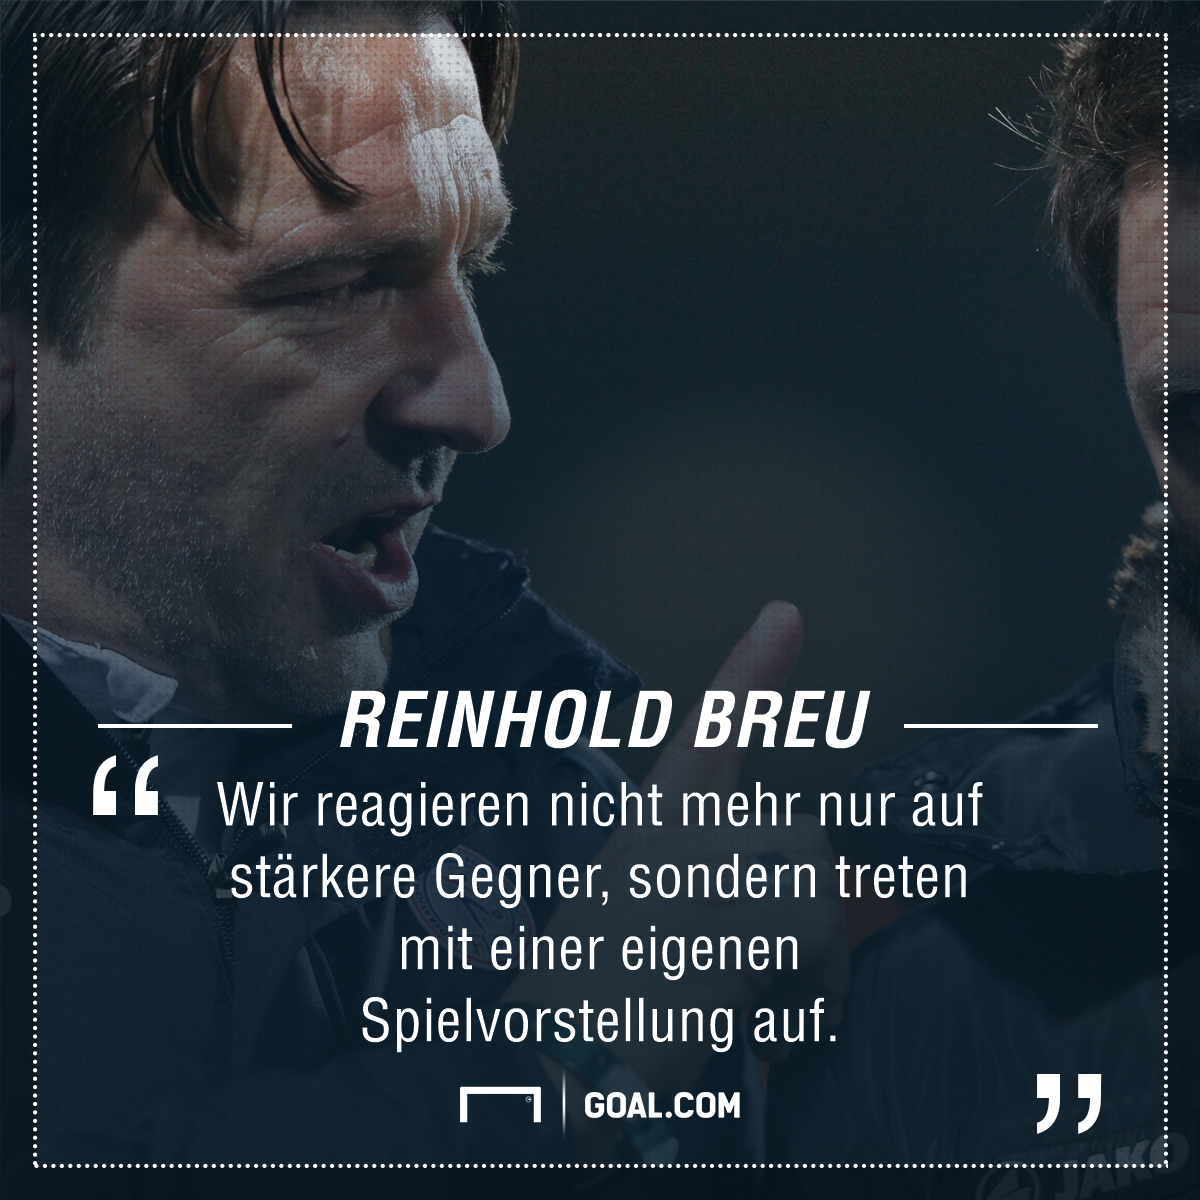 GFX Reinhold Breu Luxemburg